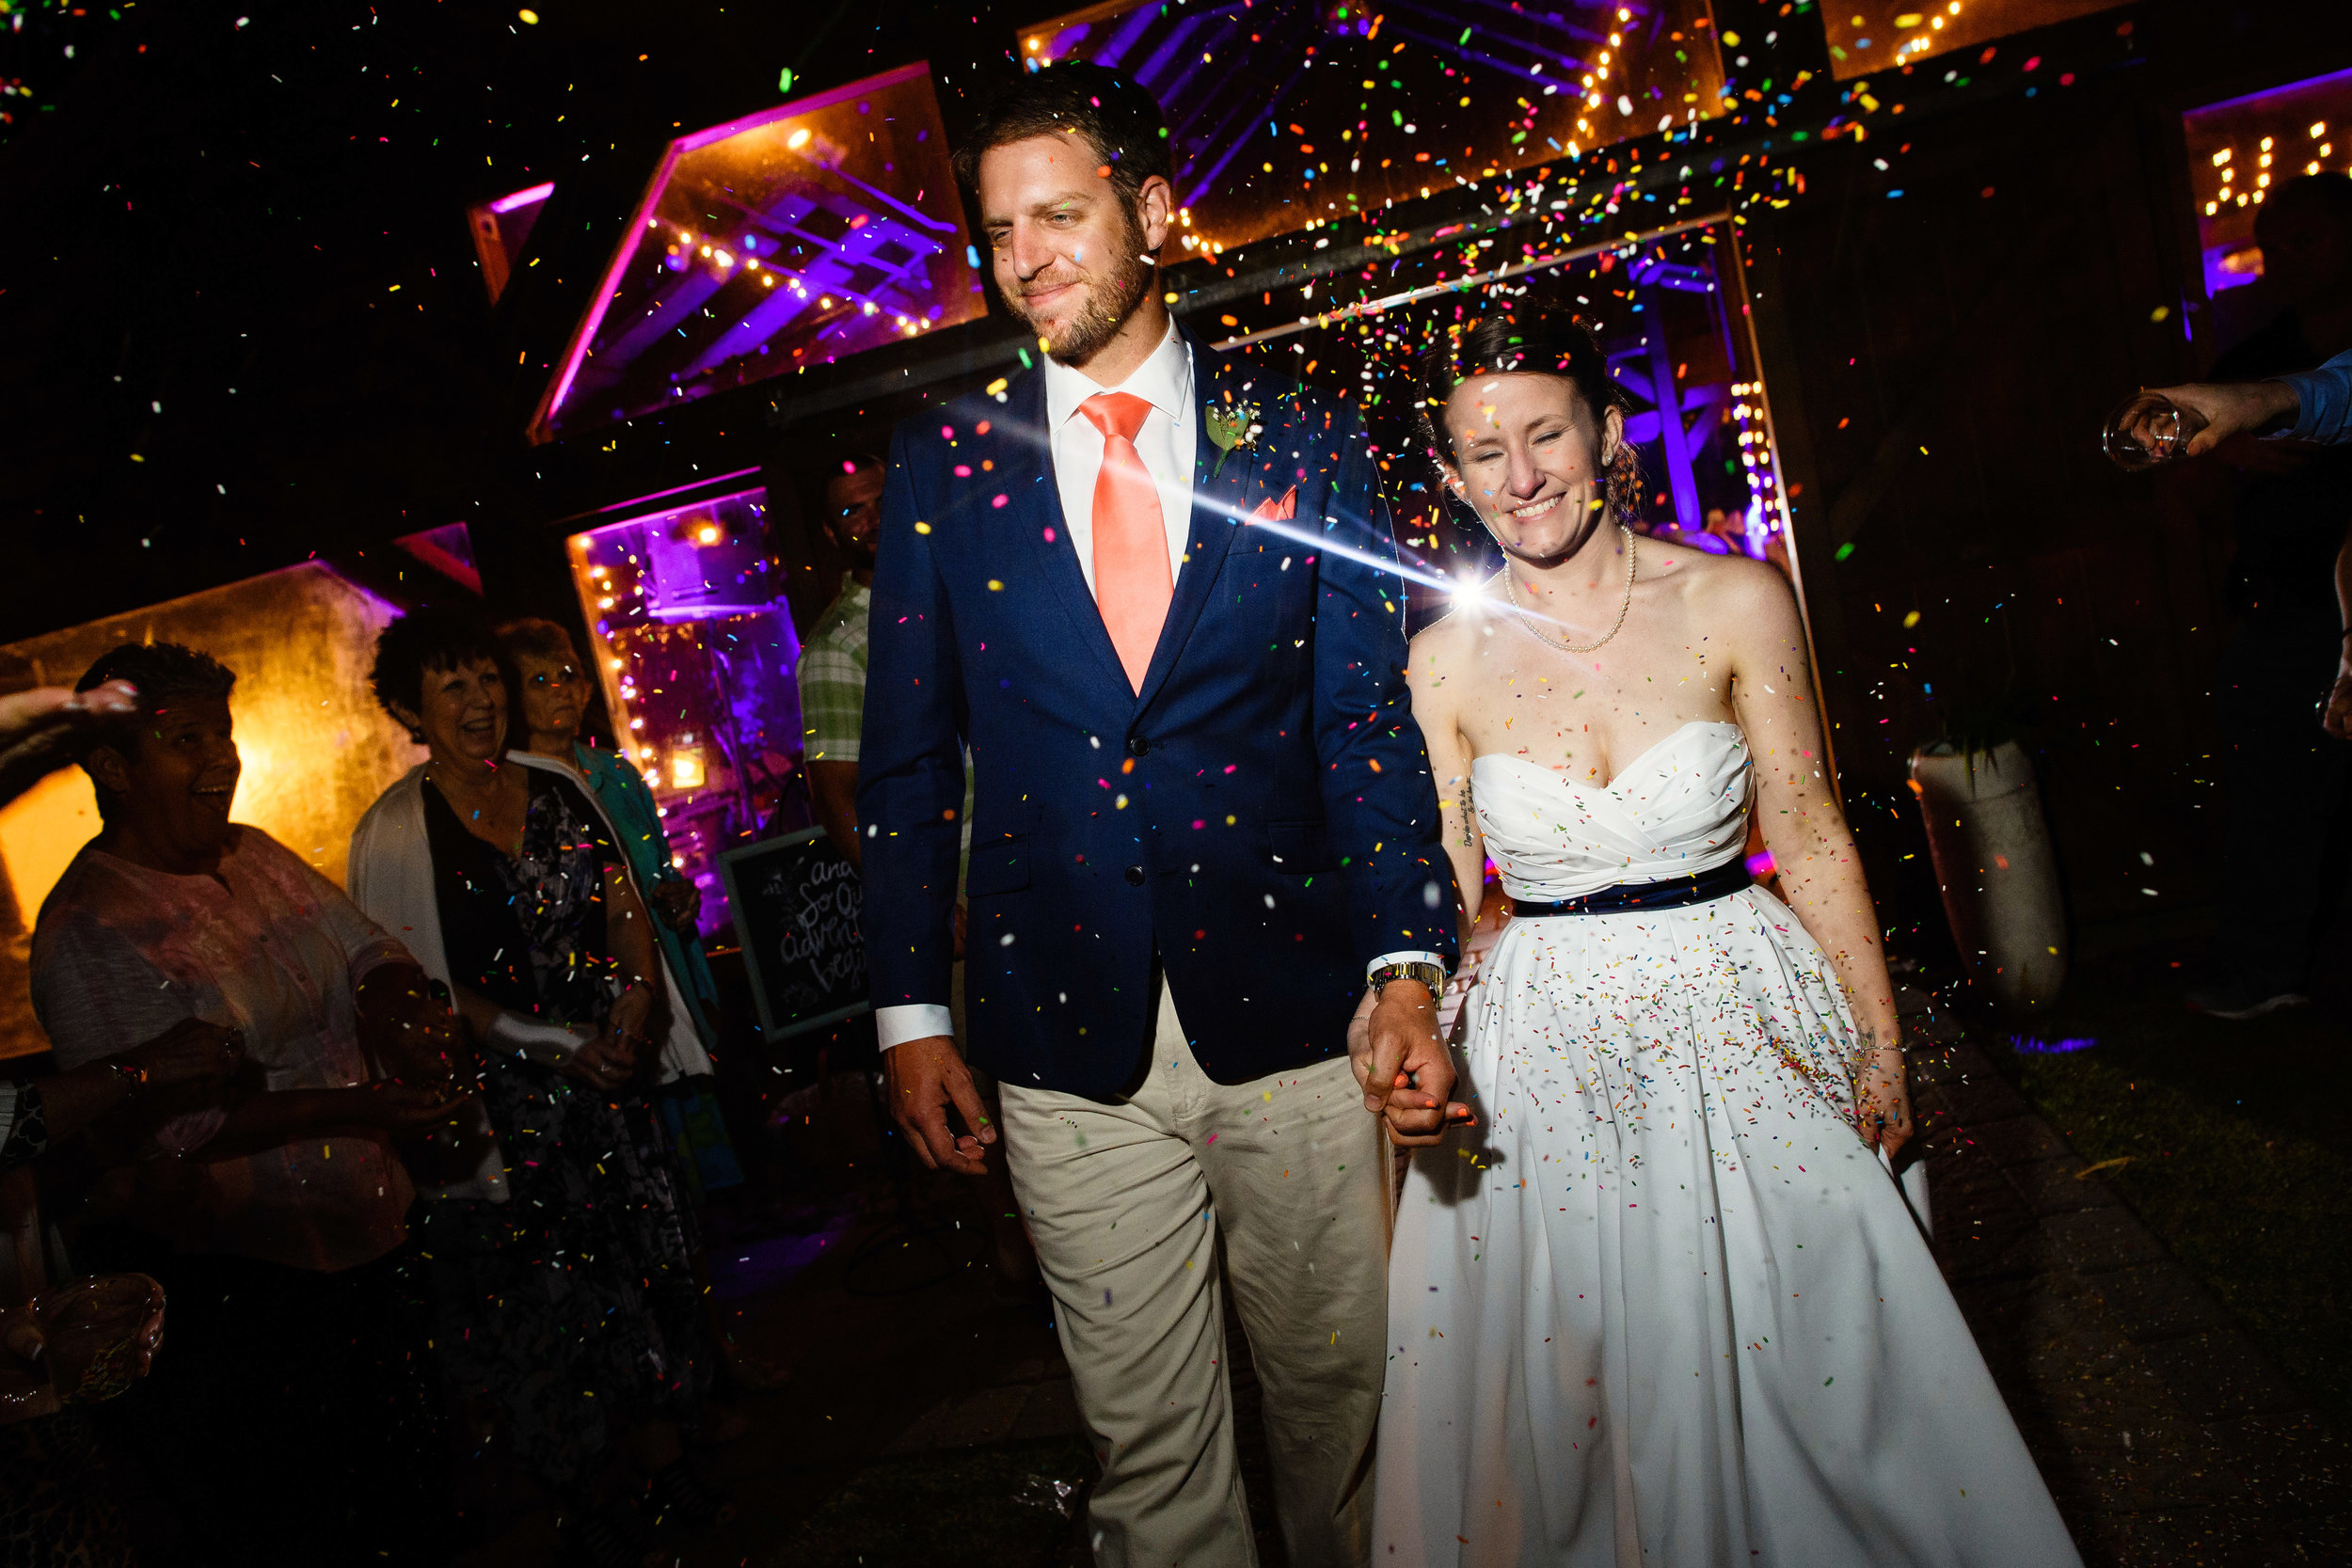 Sprinkle_toss_Wedding_Exit_NC_WEdding_Photographer